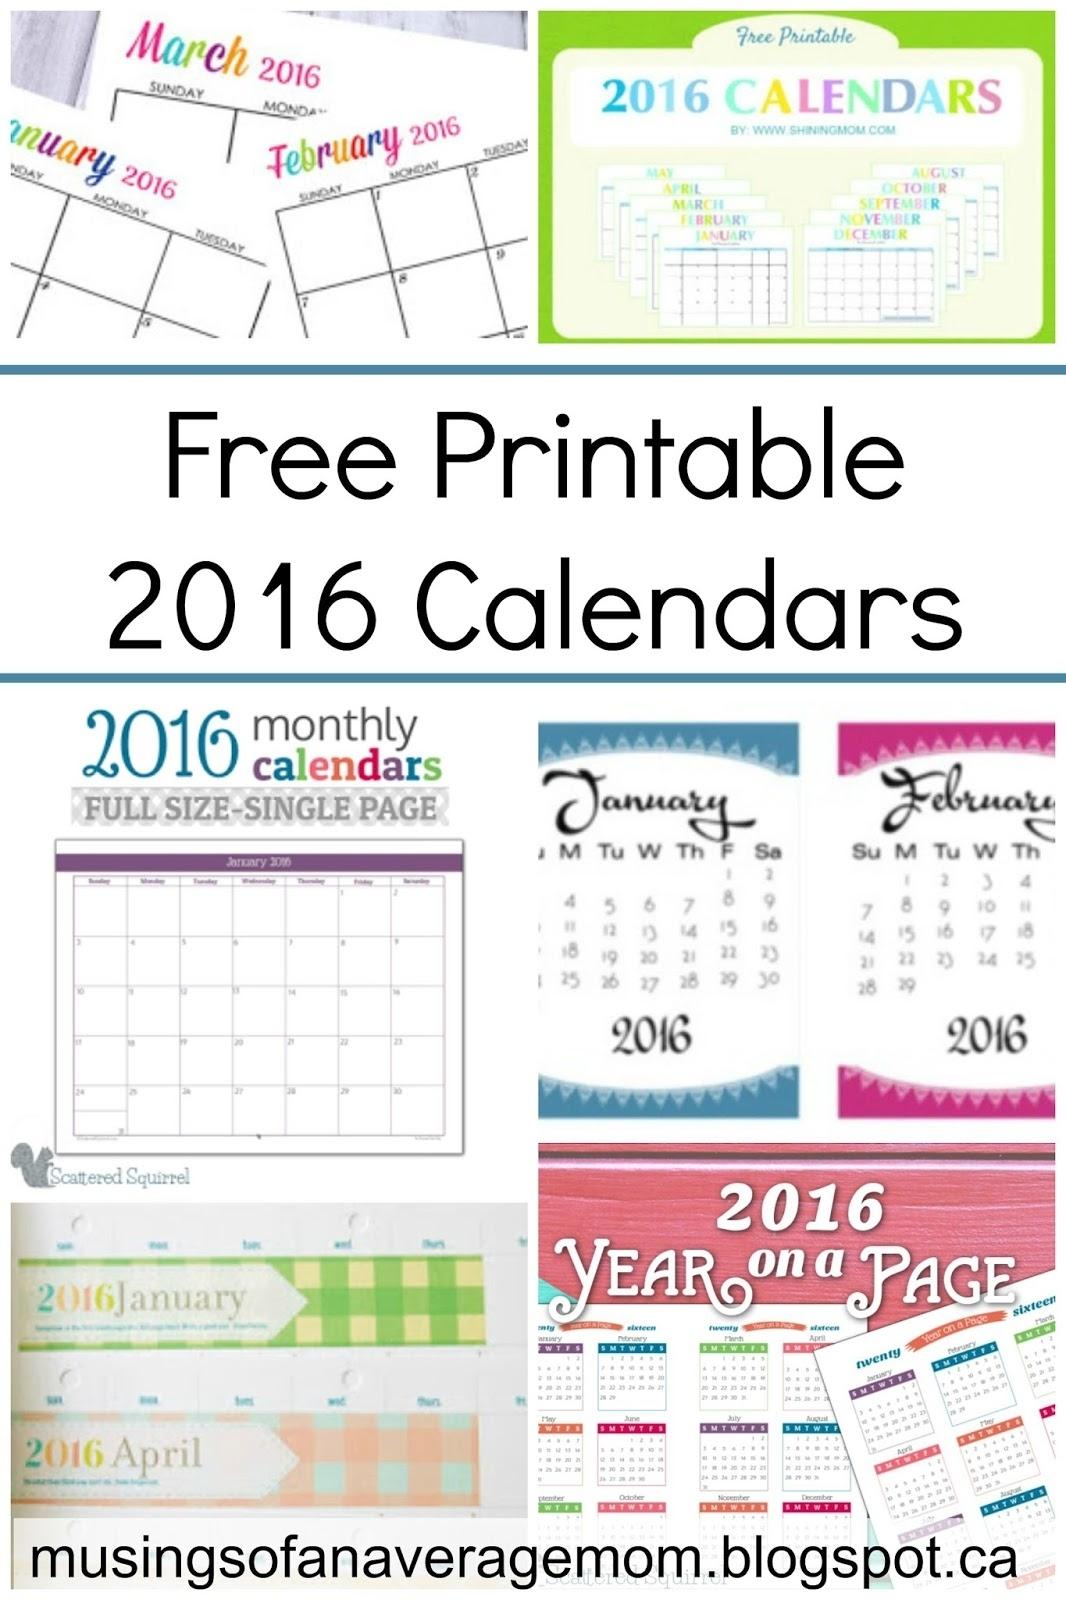 Free Printable 2016 Calendar Round-Up